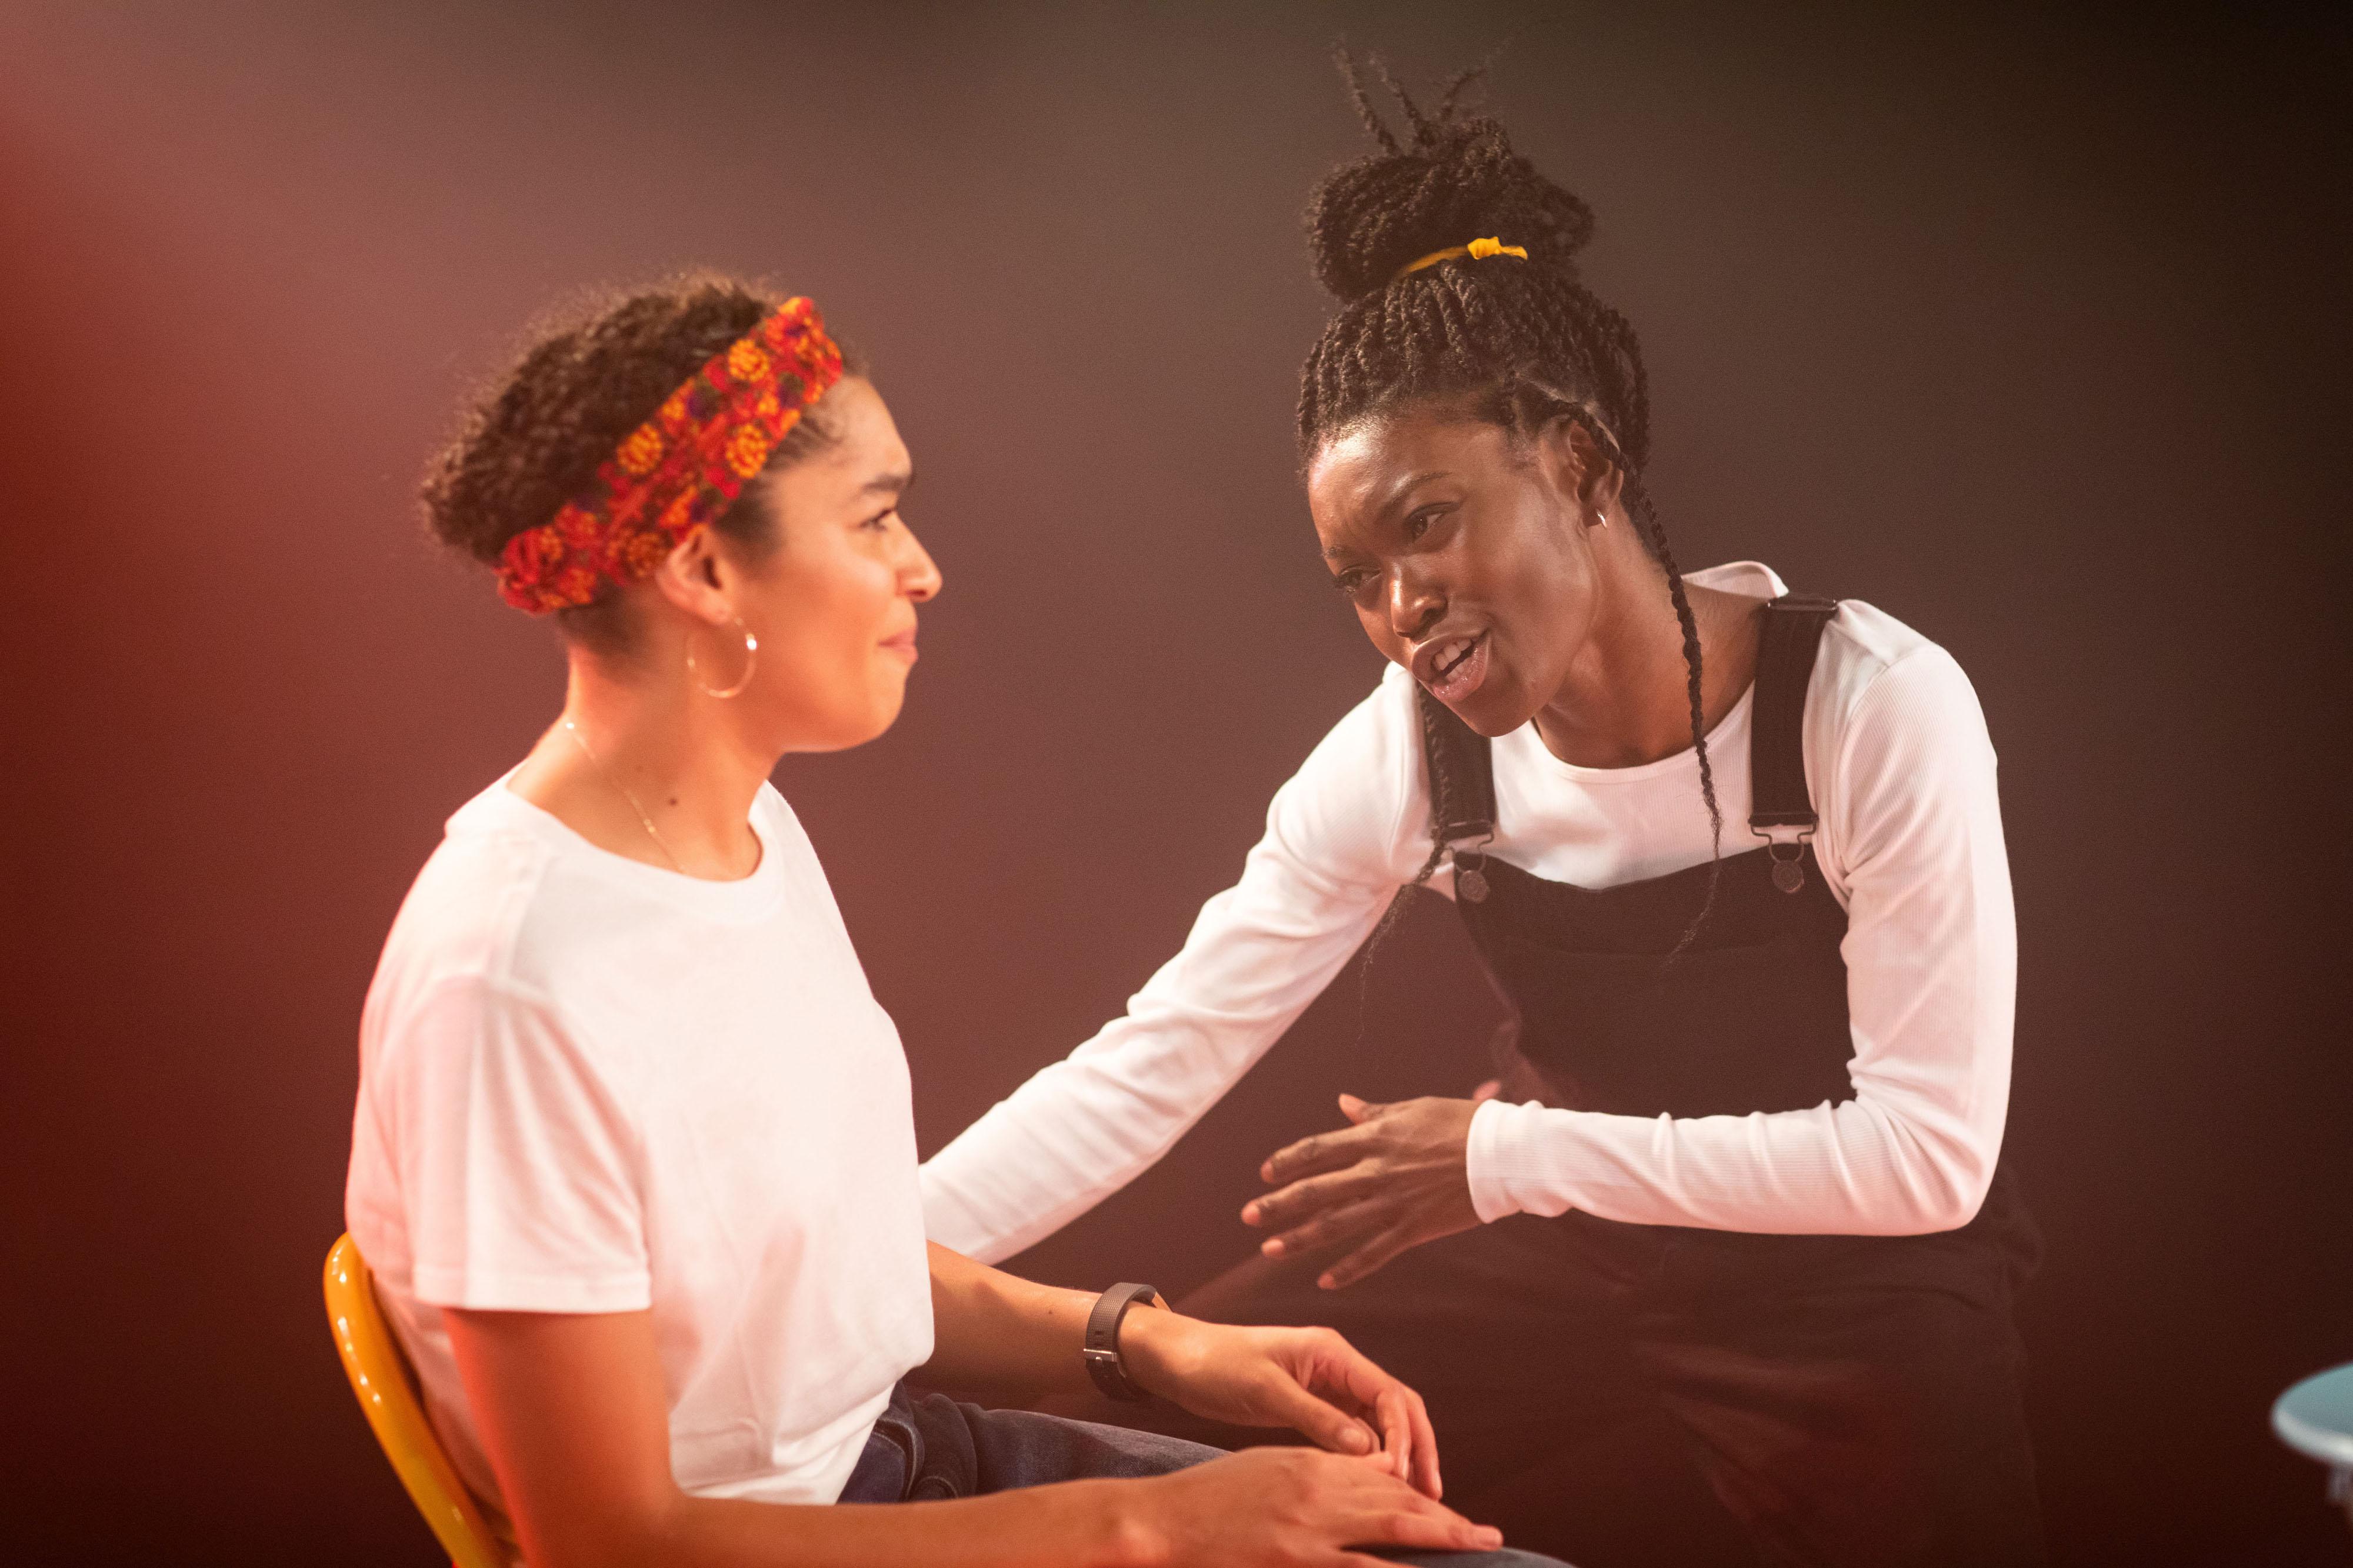 Olivia Onyehara & Tanisha Spring in Shuck 'n' Jive at Soho Theatre. Credit Helen Maybanks